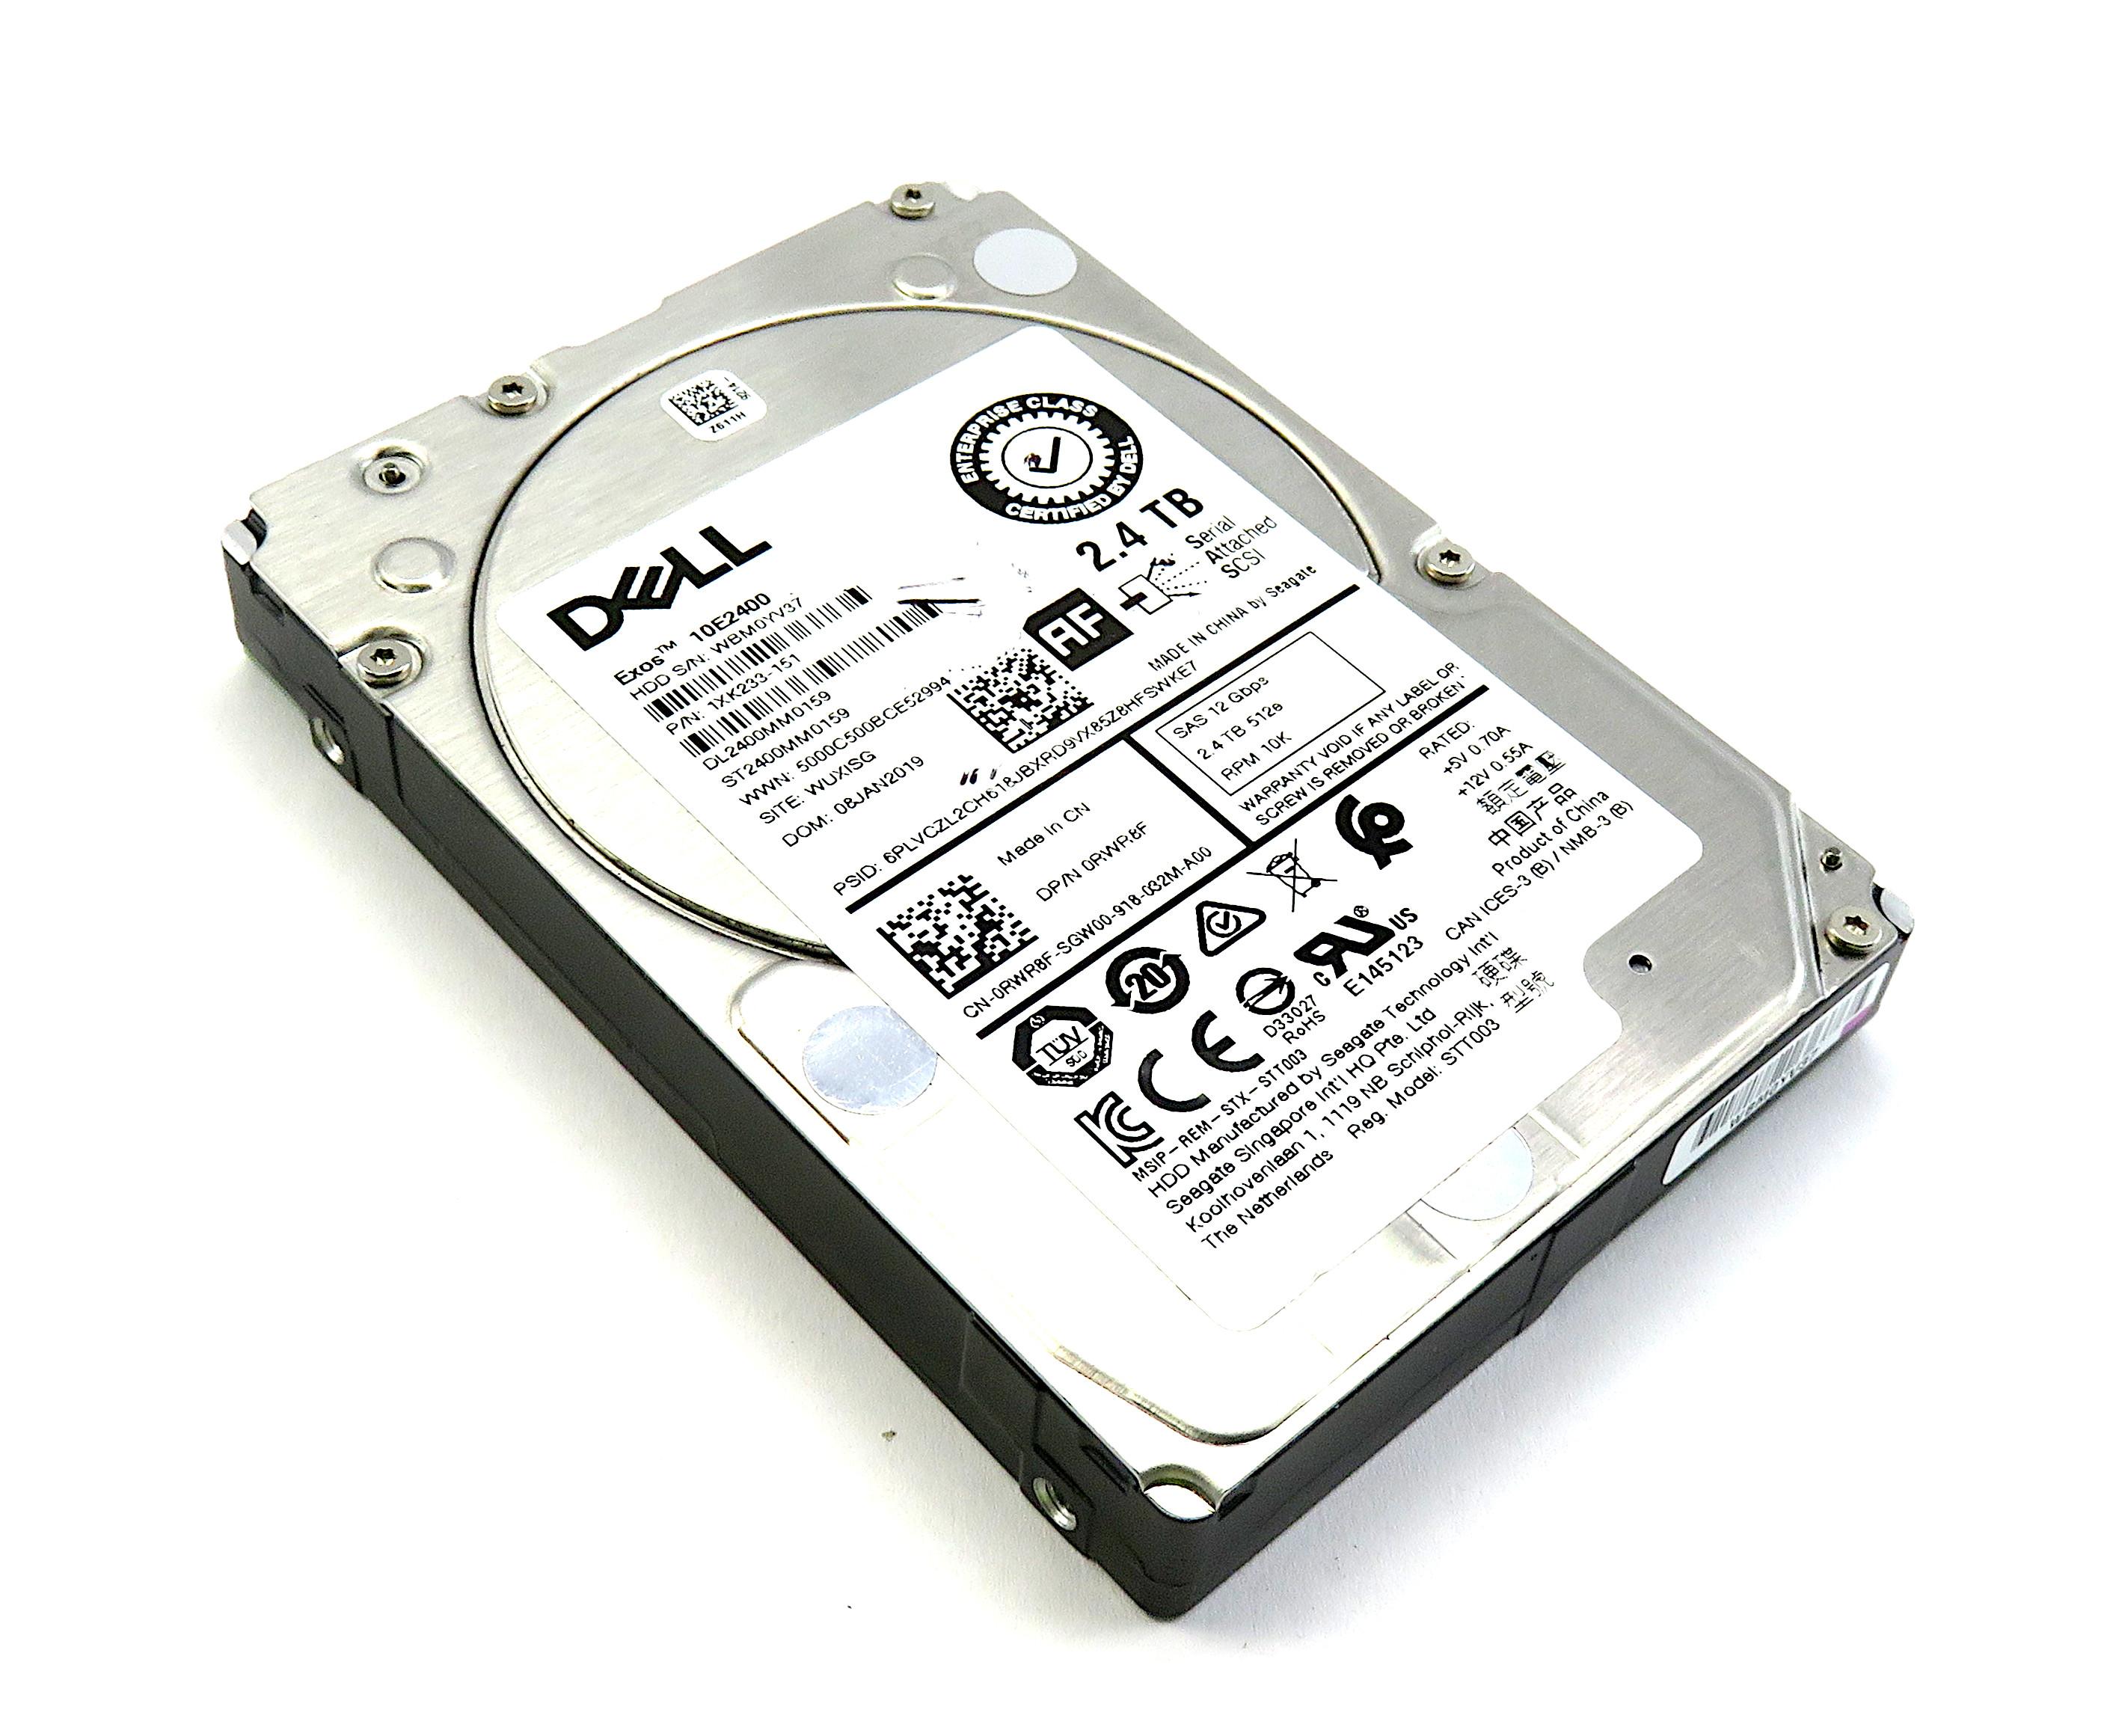 "Dell Seagate Exos 10E2400 2.4TB HDD 2.5"" SAS 12Gbps 10K - RWR8F  - 1XK233-151"